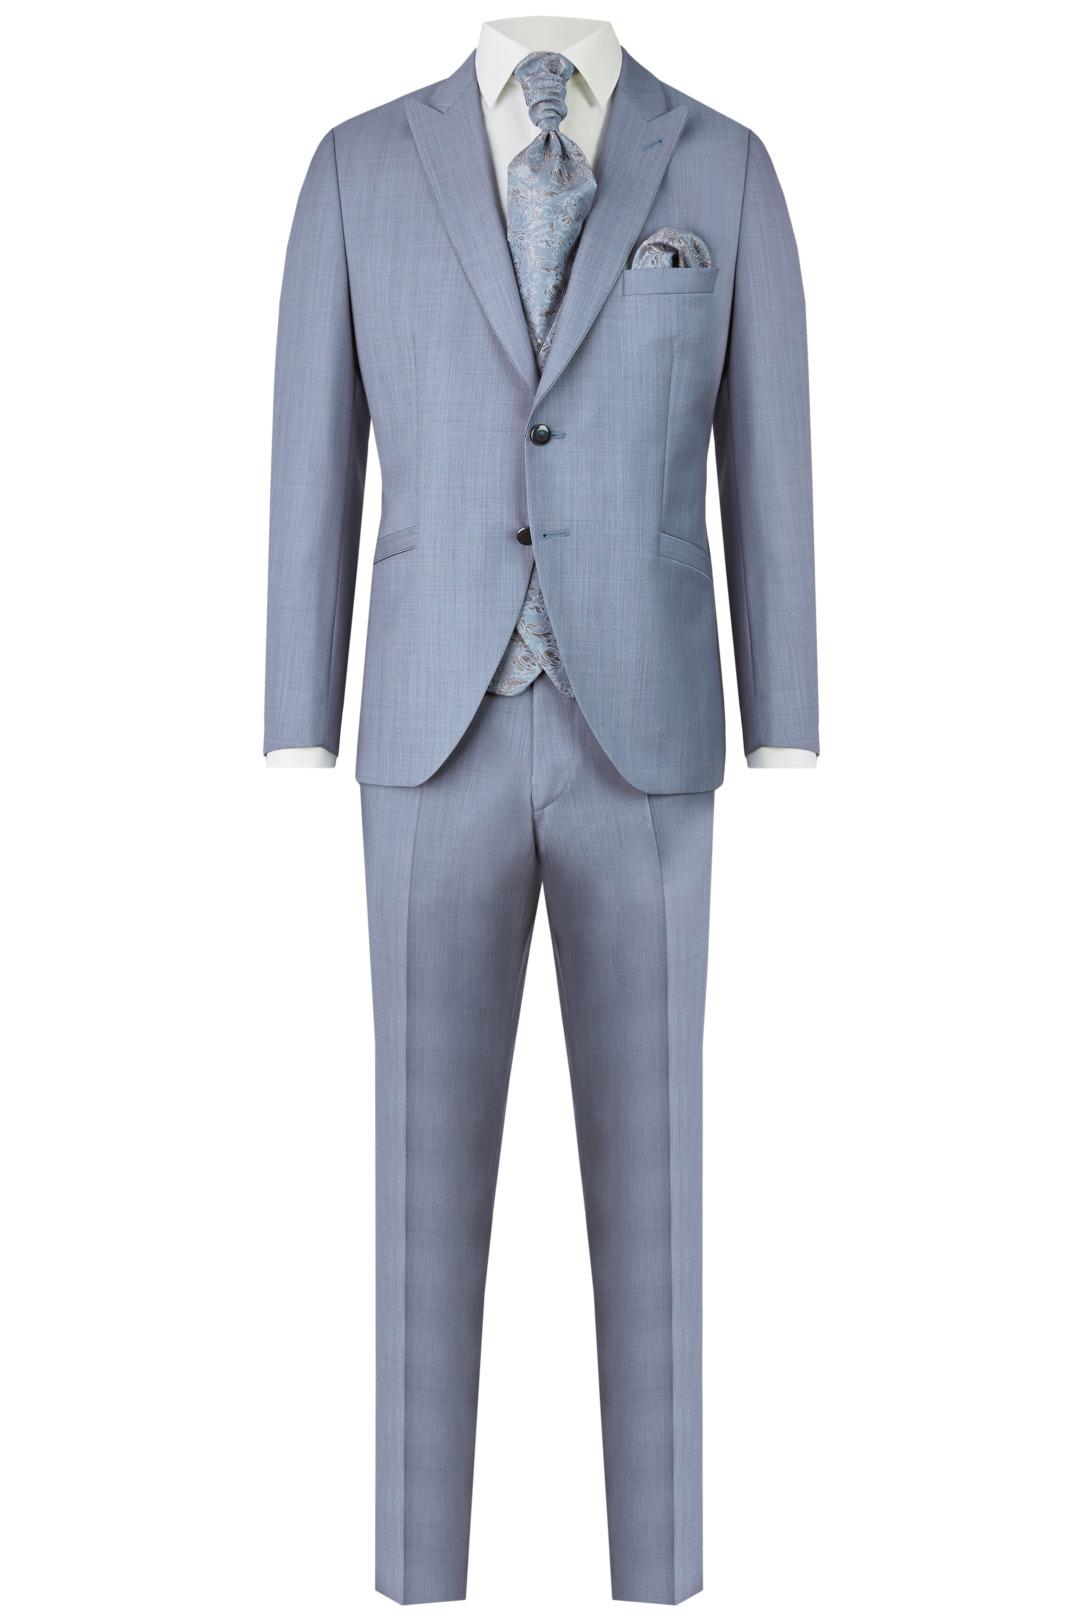 Wilvorst After Six Hochzeitsanzug Männer Mode Bräutigam klassische Form hellblau wil_0121_otf_as-look-8_1